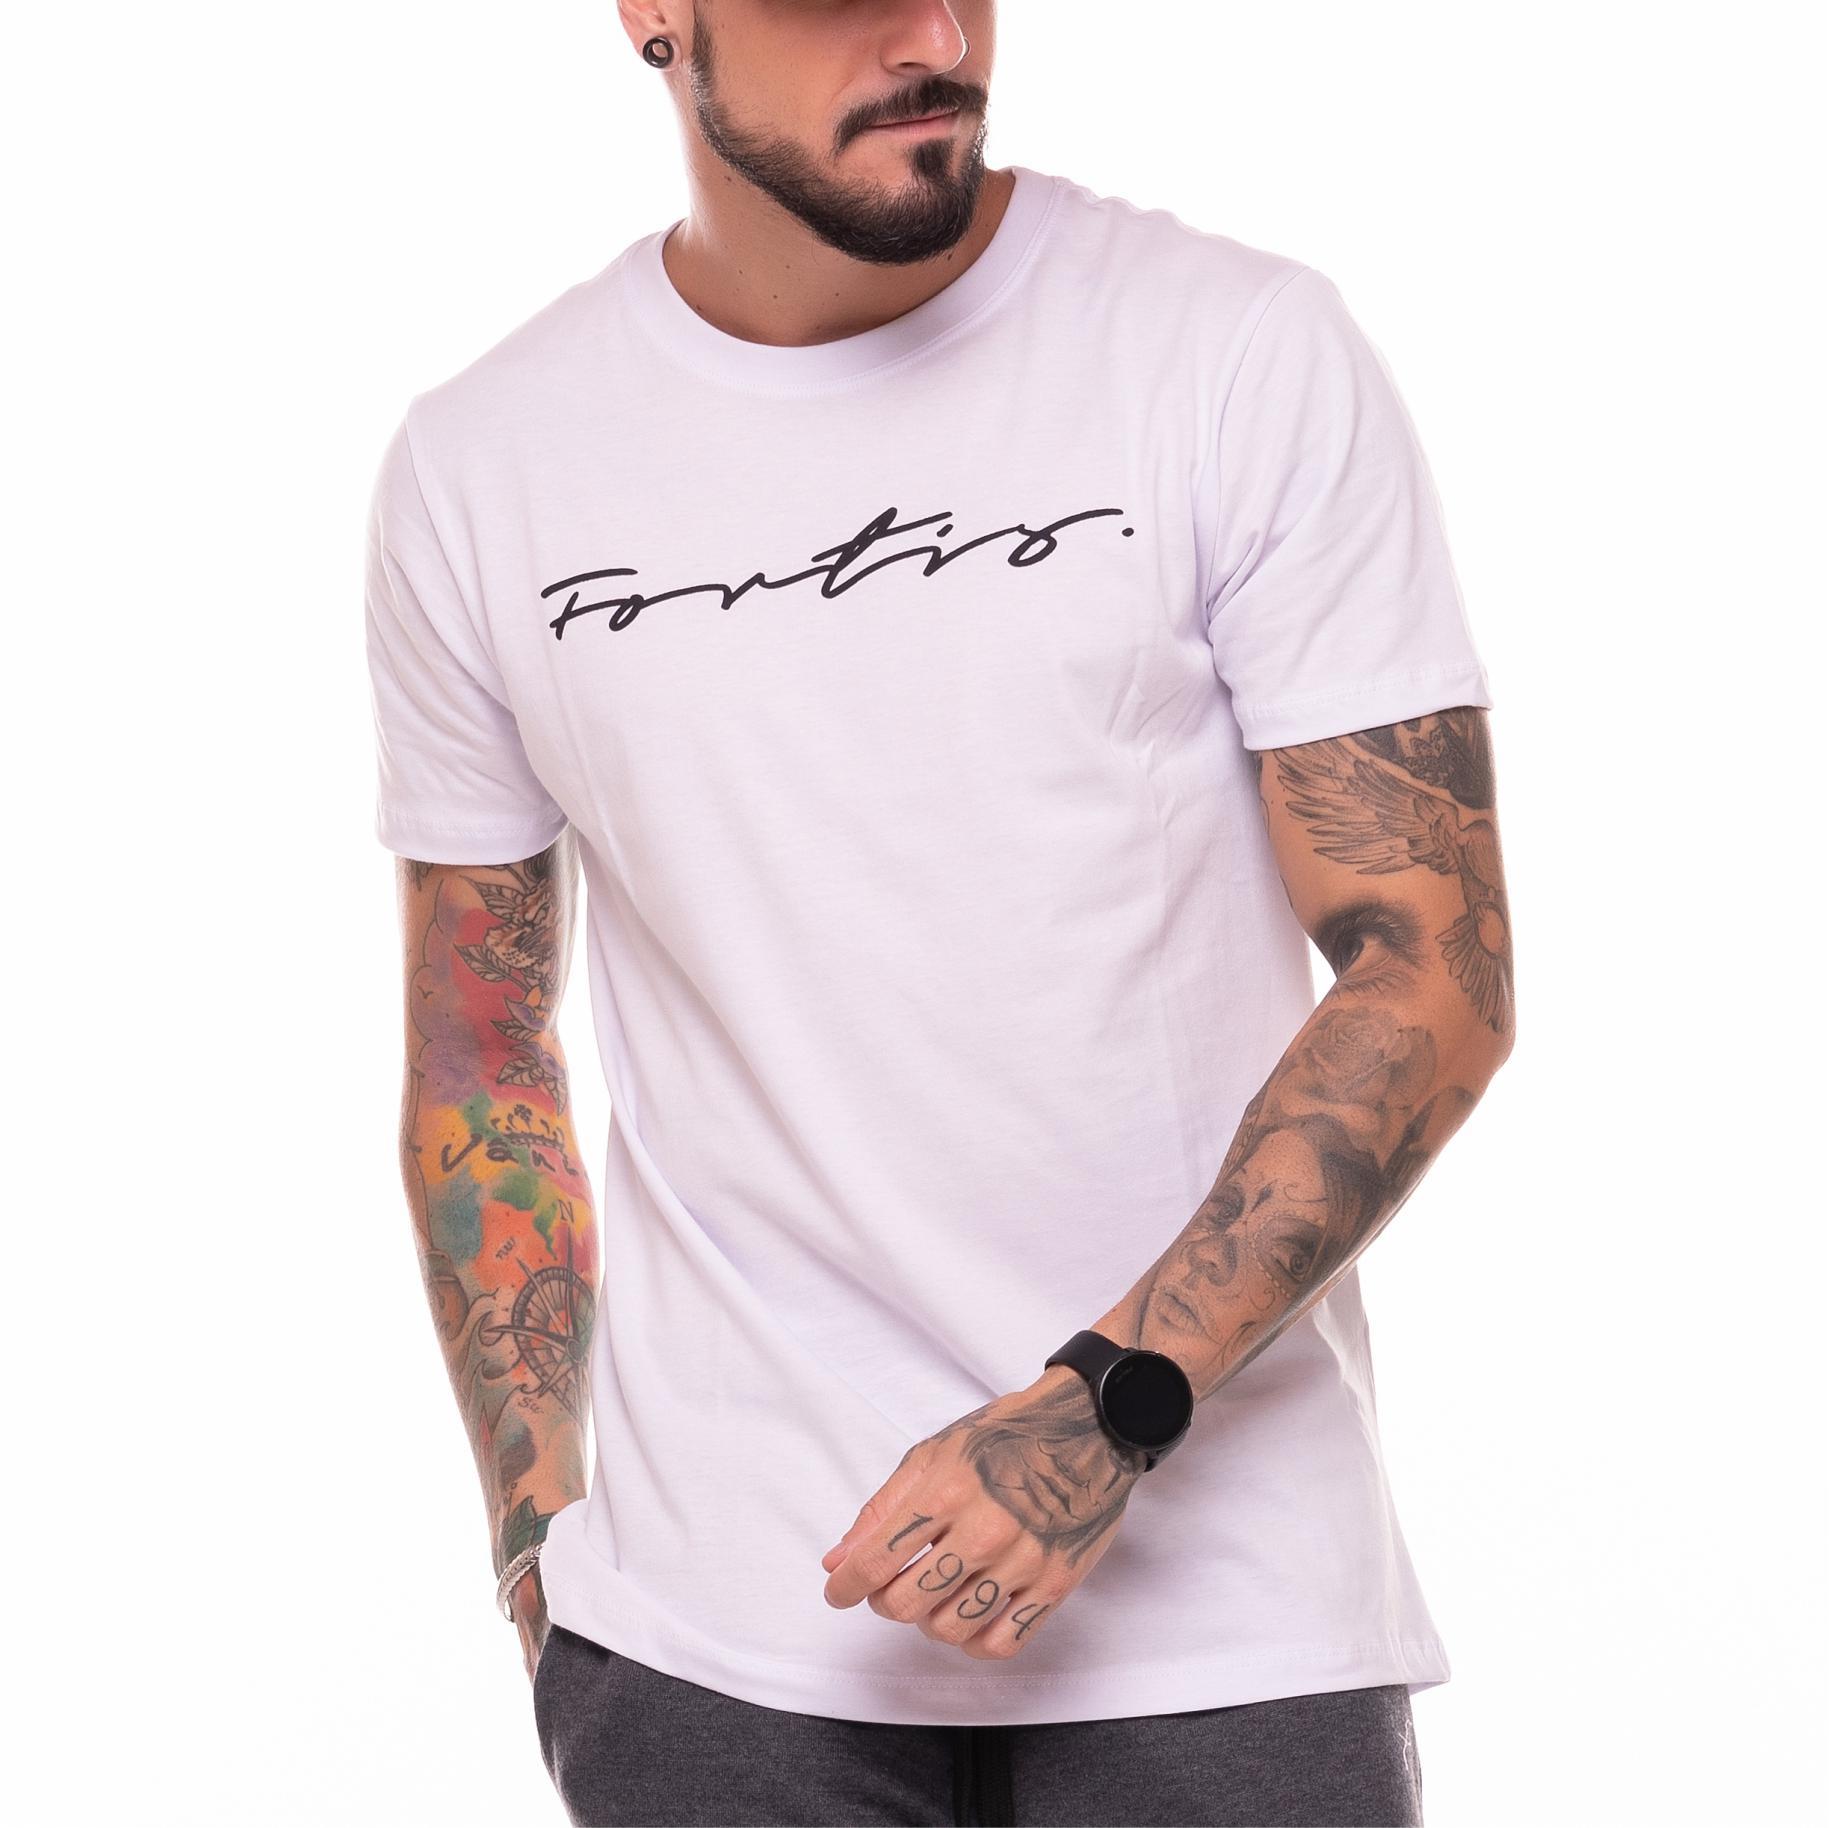 Camiseta Fortis Branca